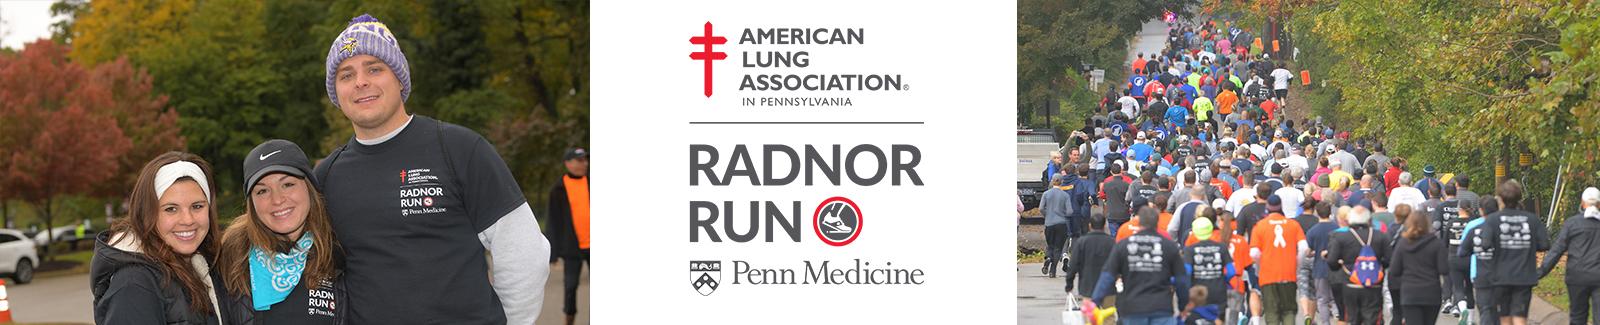 Penn Medicine Radnor Run - American Lung Association